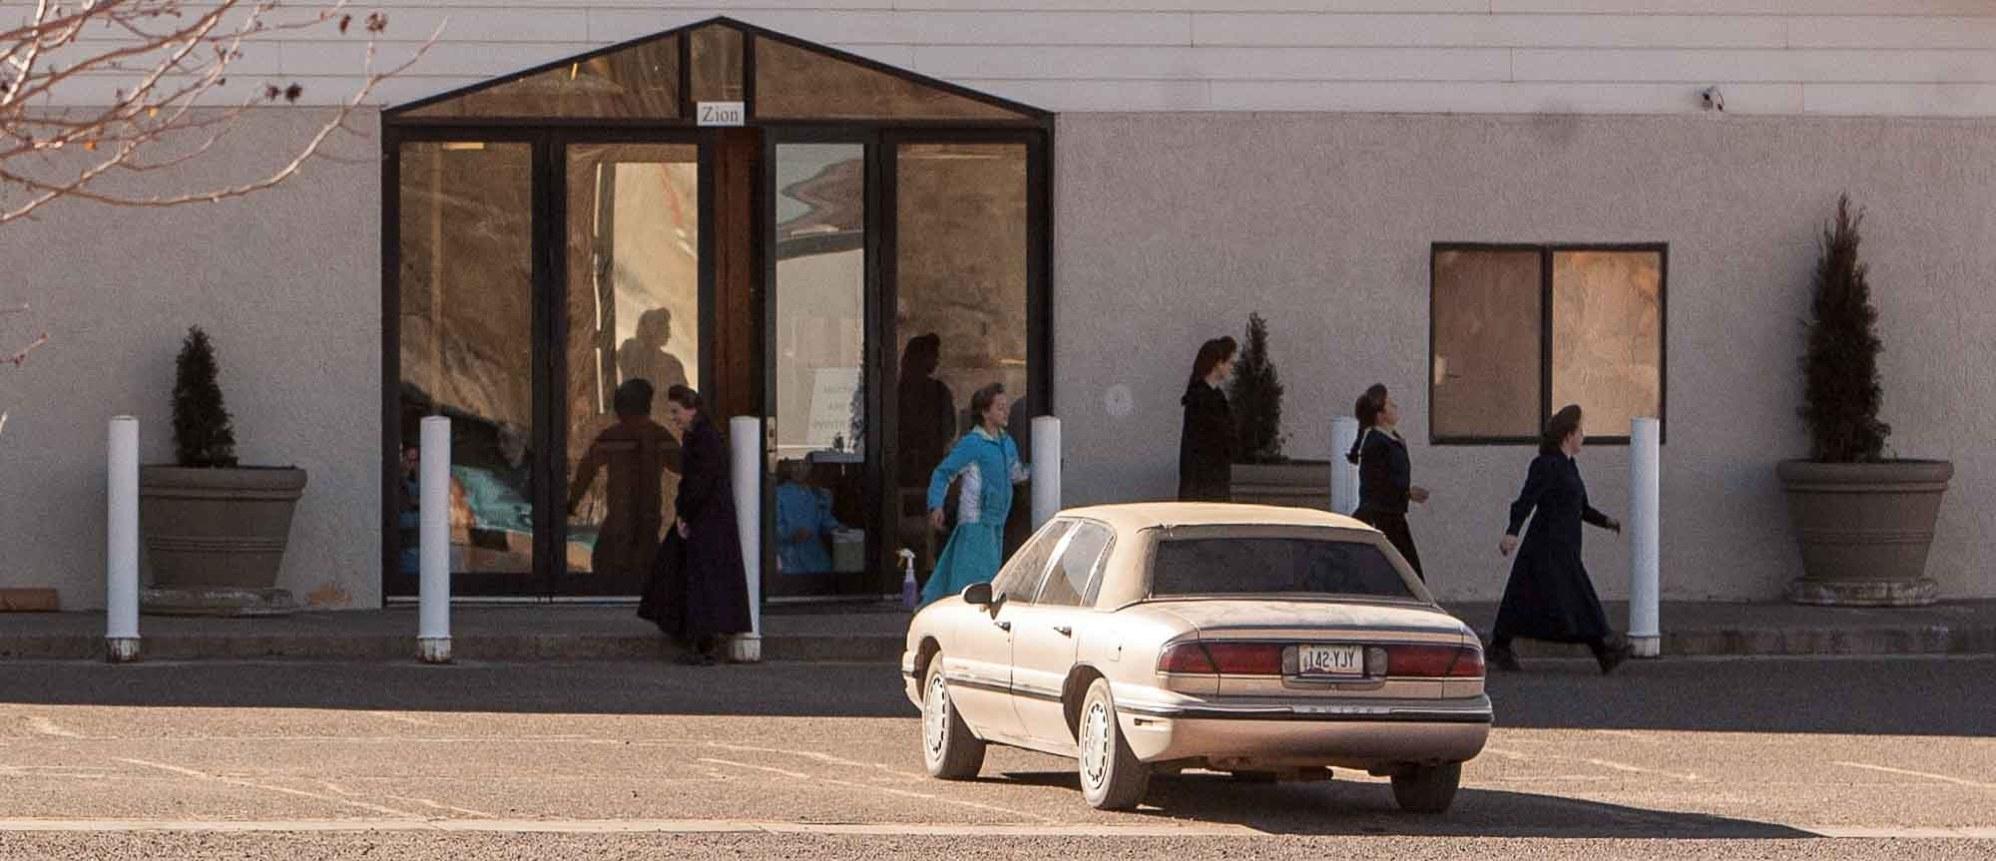 Trent Nelson | The Salt Lake Tribune lsj meeting house, driving around, in Colorado City, Arizona, Saturday, January 14, 2012.